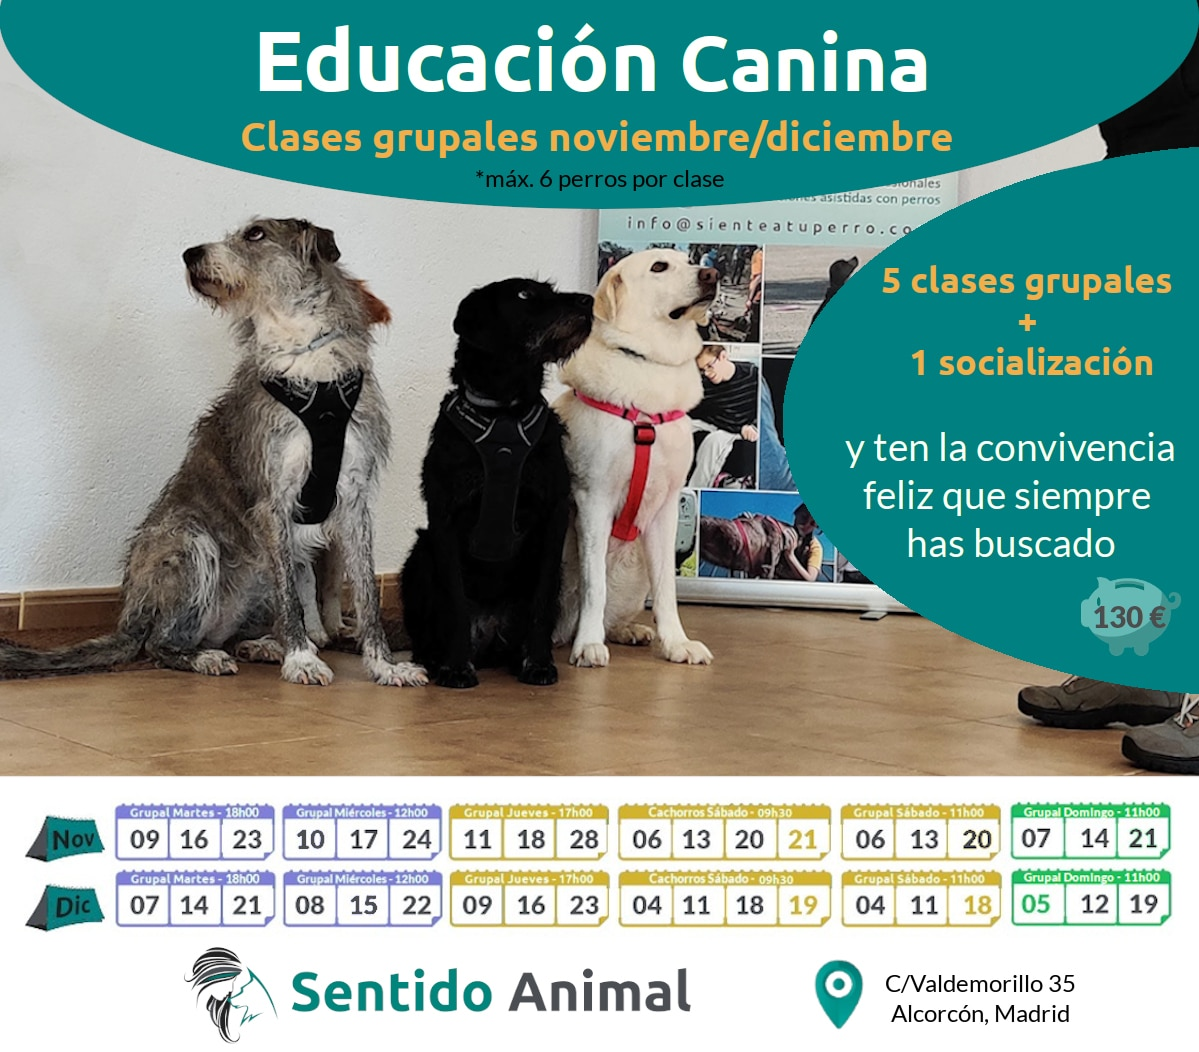 Mini-Curso de clases de educación canina – martes – nov21